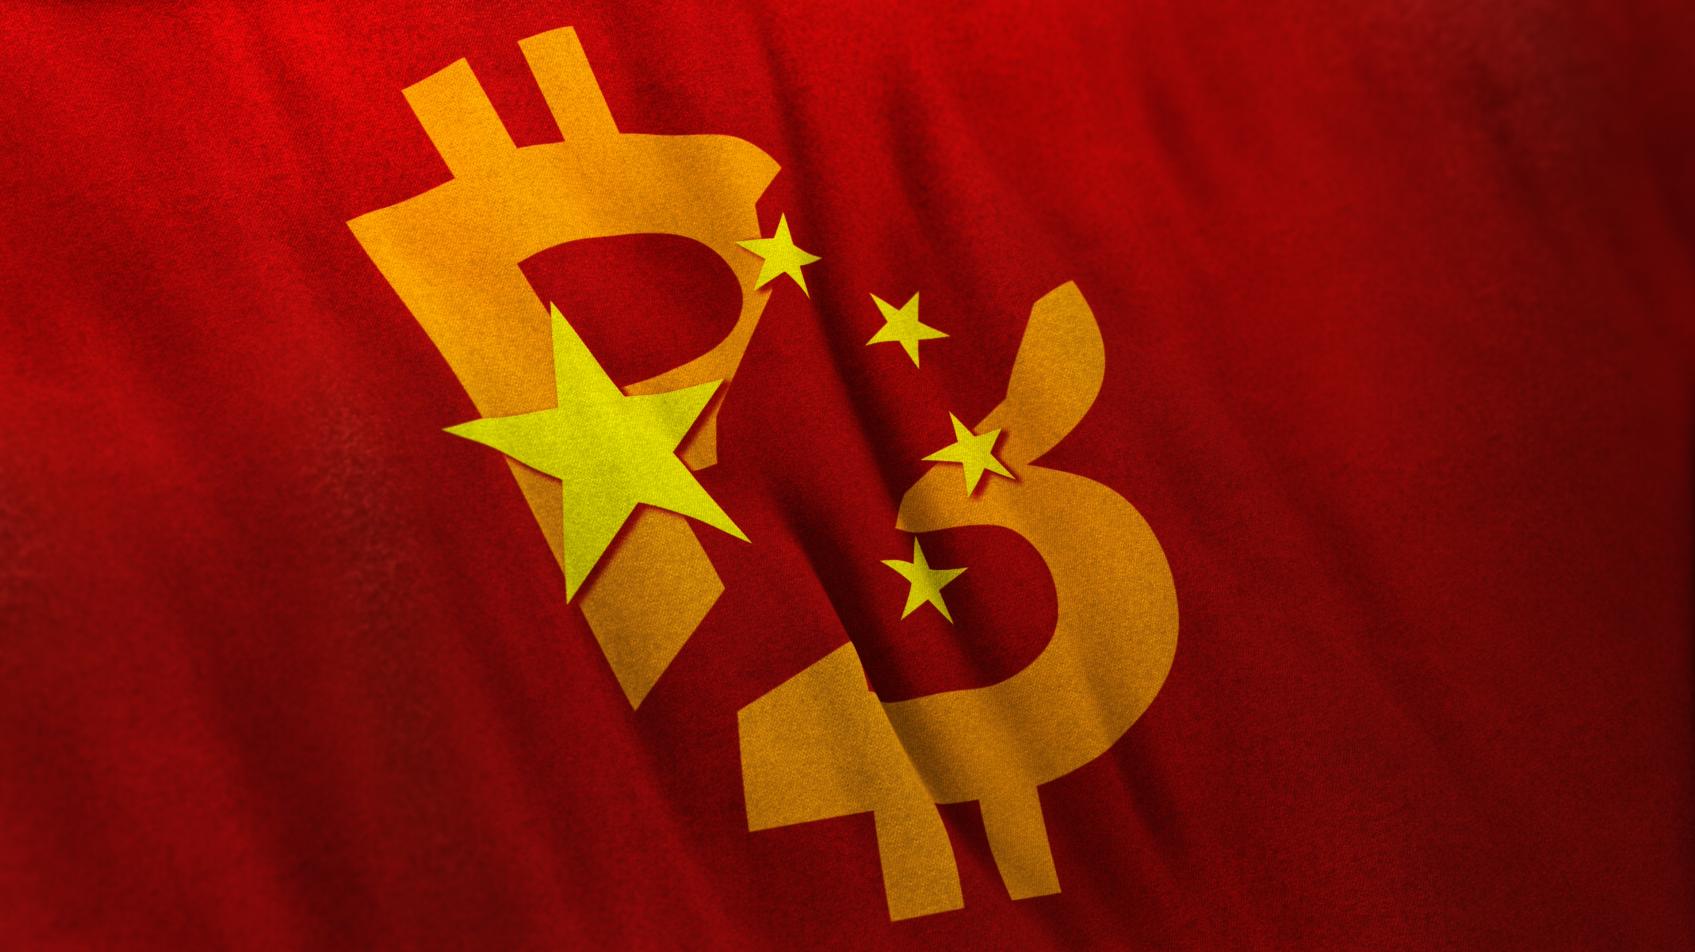 China Flag with cracked bitcoin icon, China's blockchain flourishing when cracking down on crypto